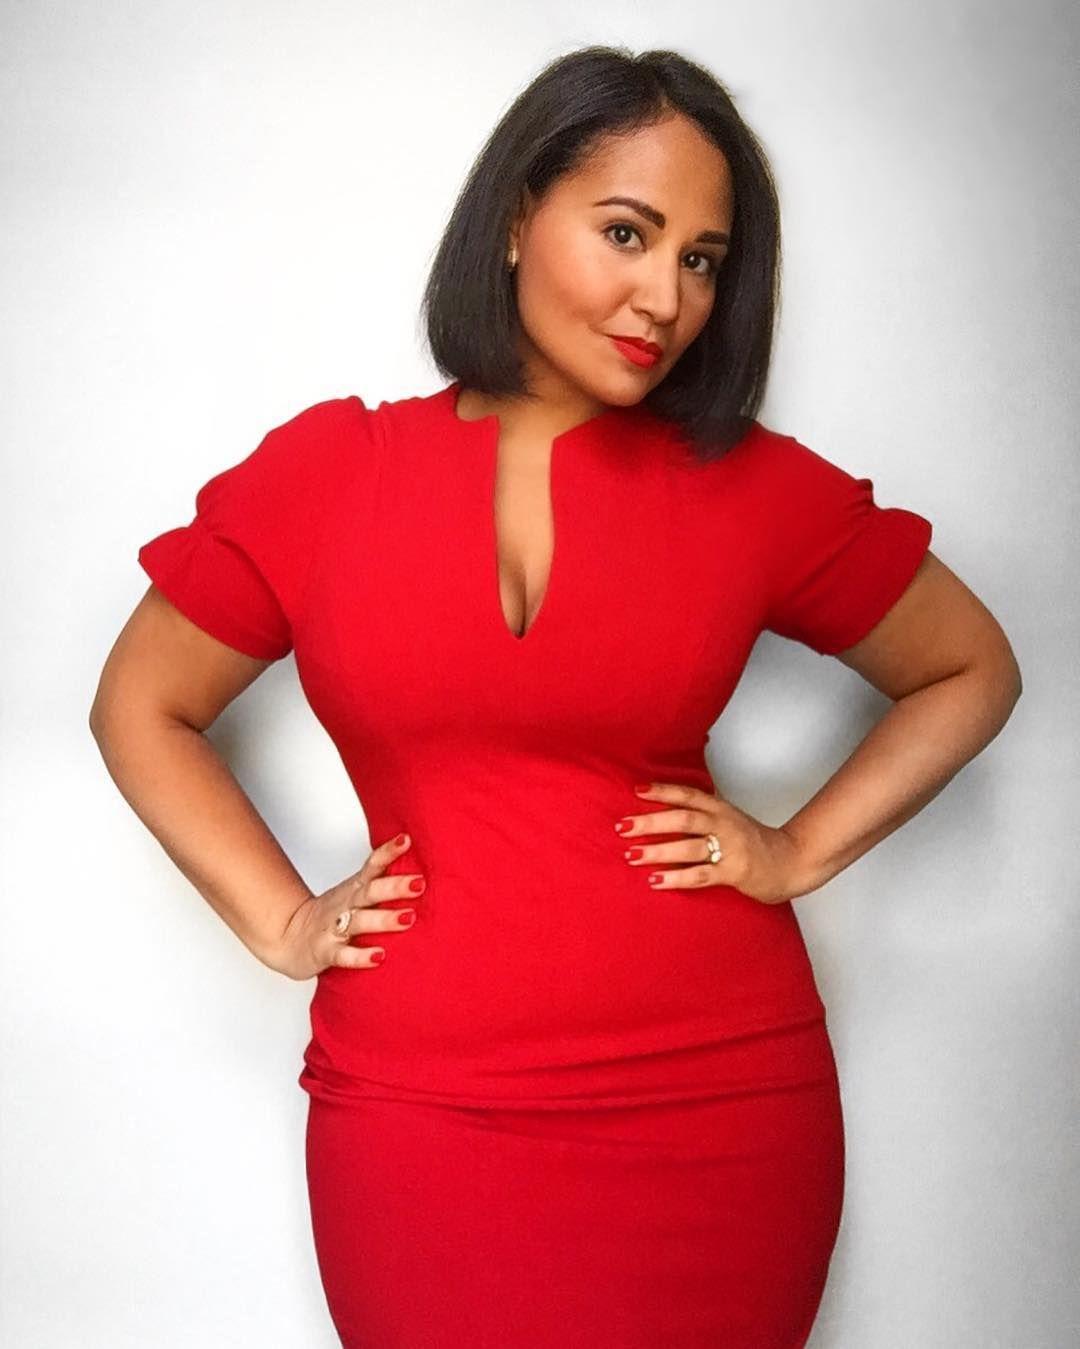 Alejandra Ramos Alwaysalejandra Dream Of A Red Dress By Blackhalostyle Perfect For Curvy Figures Dresses Fashion Curvy Fashion [ 1349 x 1080 Pixel ]